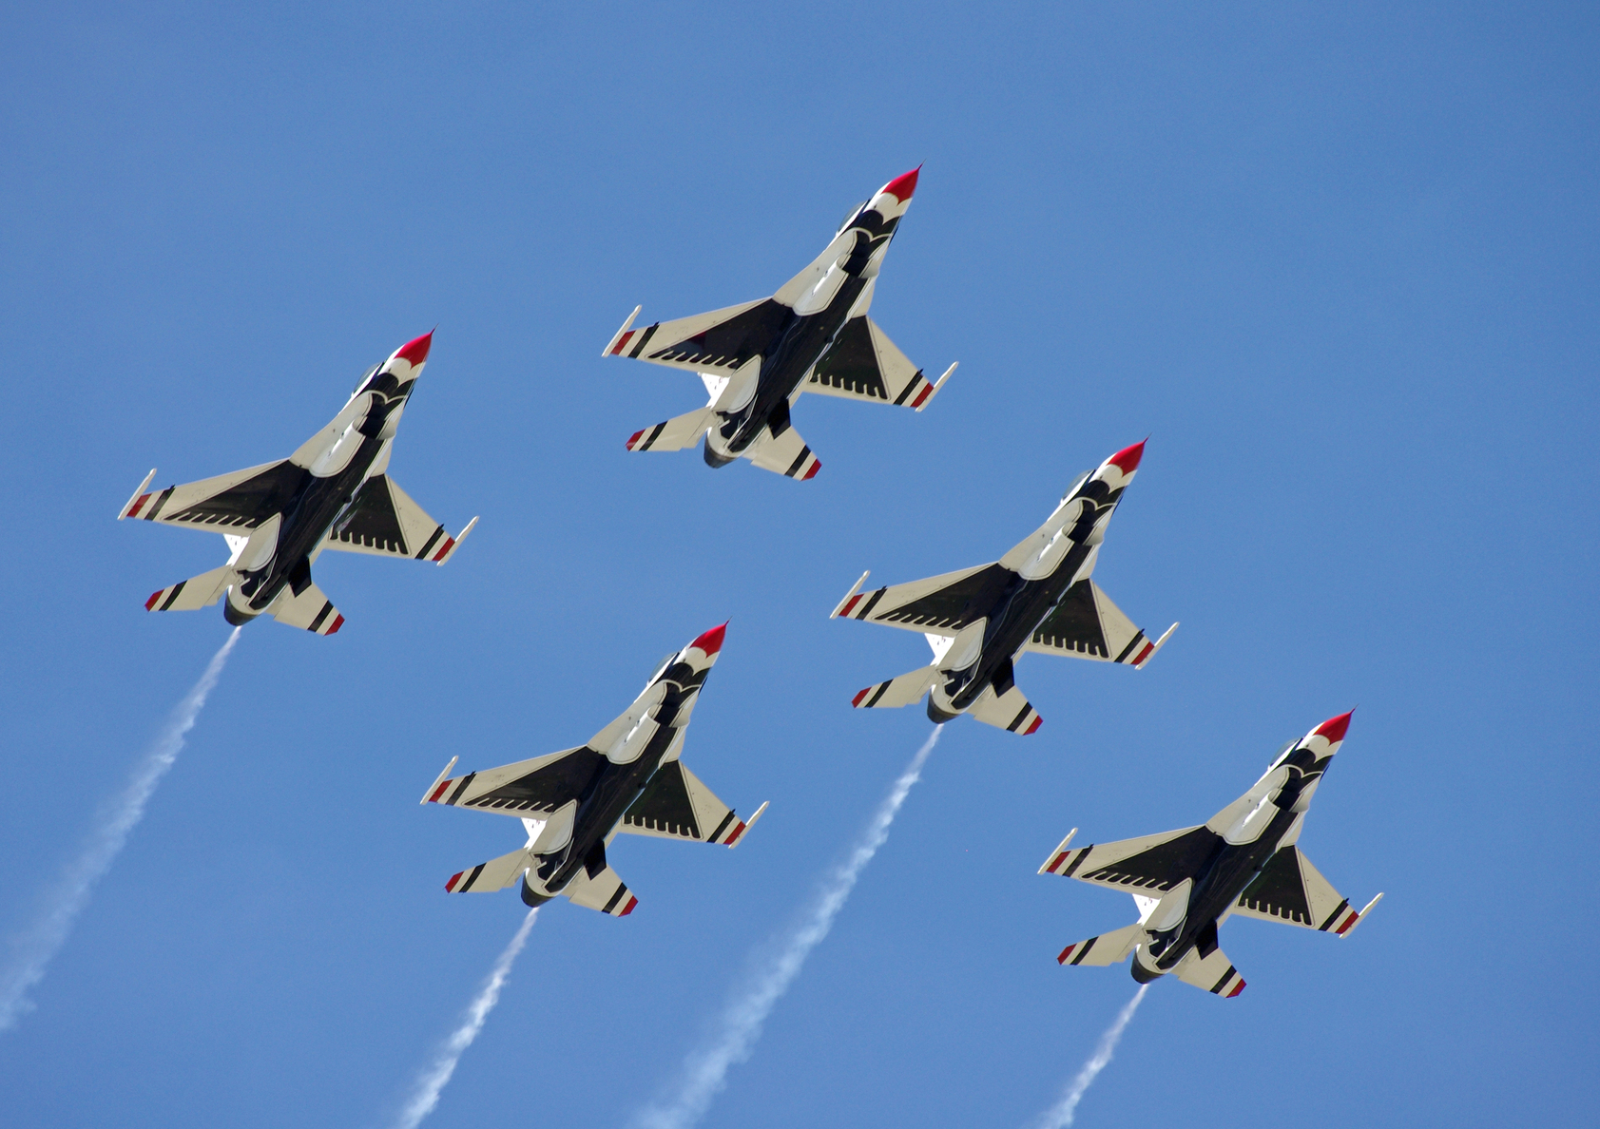 Air_Force_planes.jpg